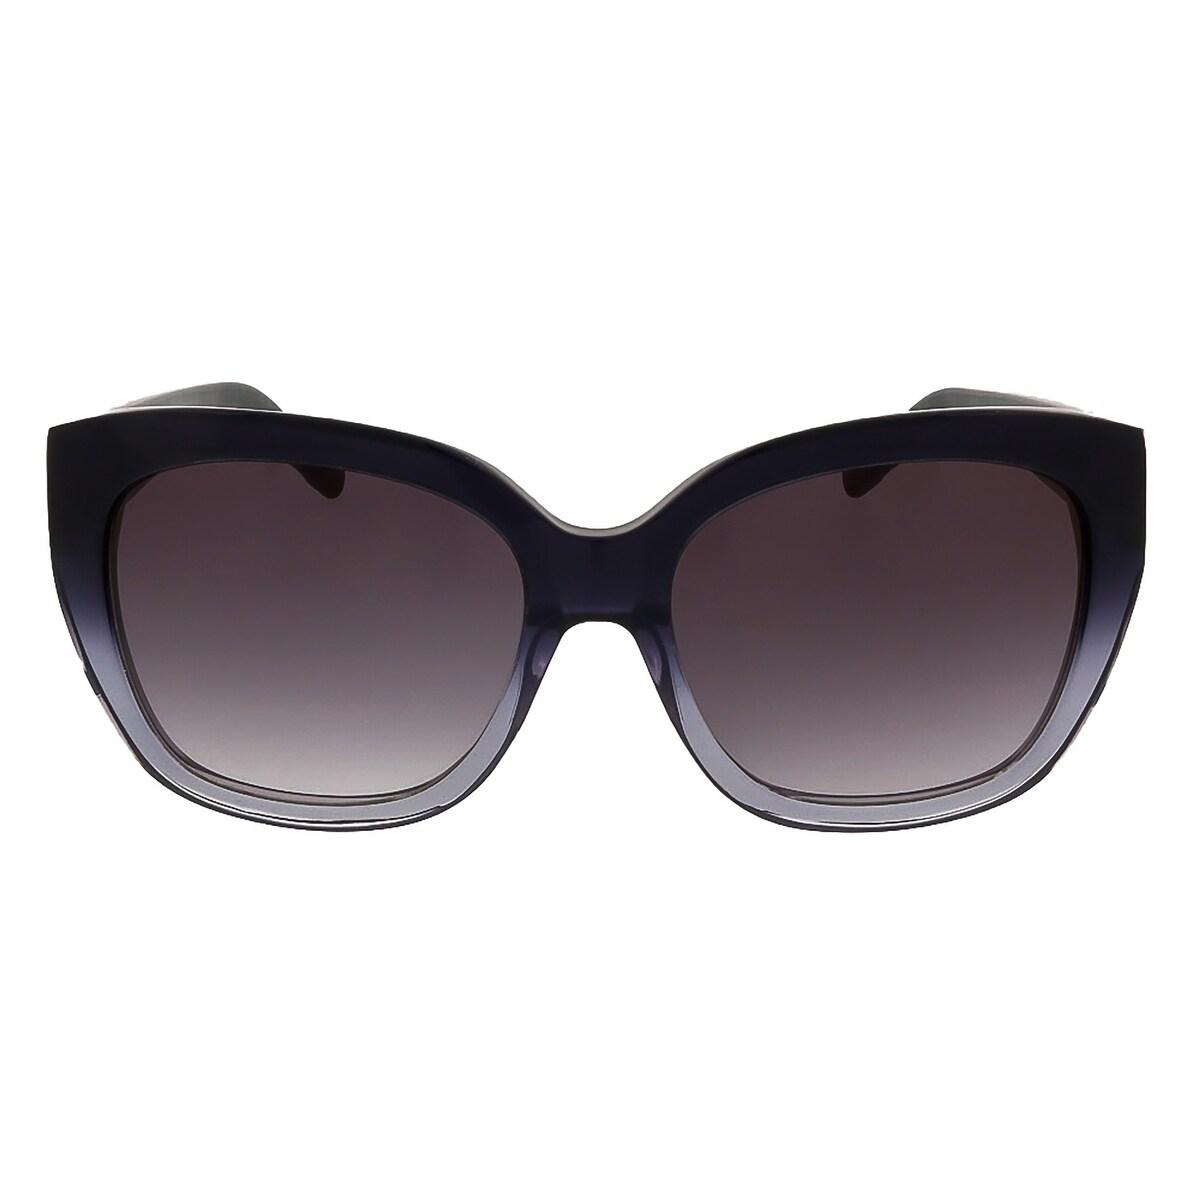 d0ceddde3a Shop Karl Lagerfeld KL866 S 050 Navy Blue Cat Eye Sunglasses - 56-17-135 -  Free Shipping Today - Overstock.com - 15342510